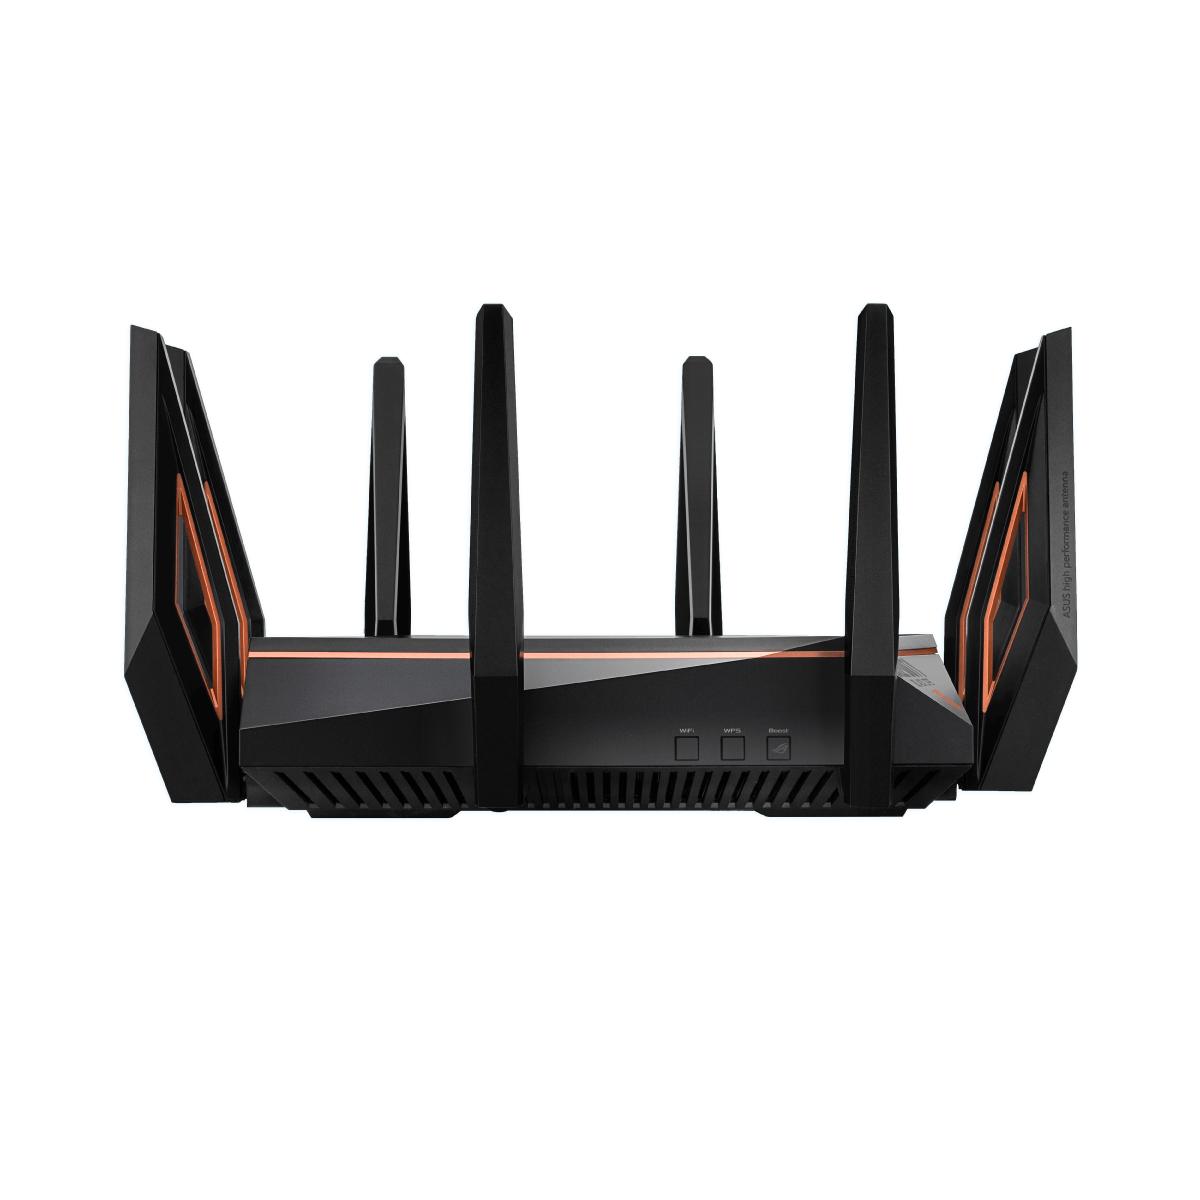 AX11000 三頻 WiFi 6 (802.11ax)  10 Gigabit 電競無線路由器